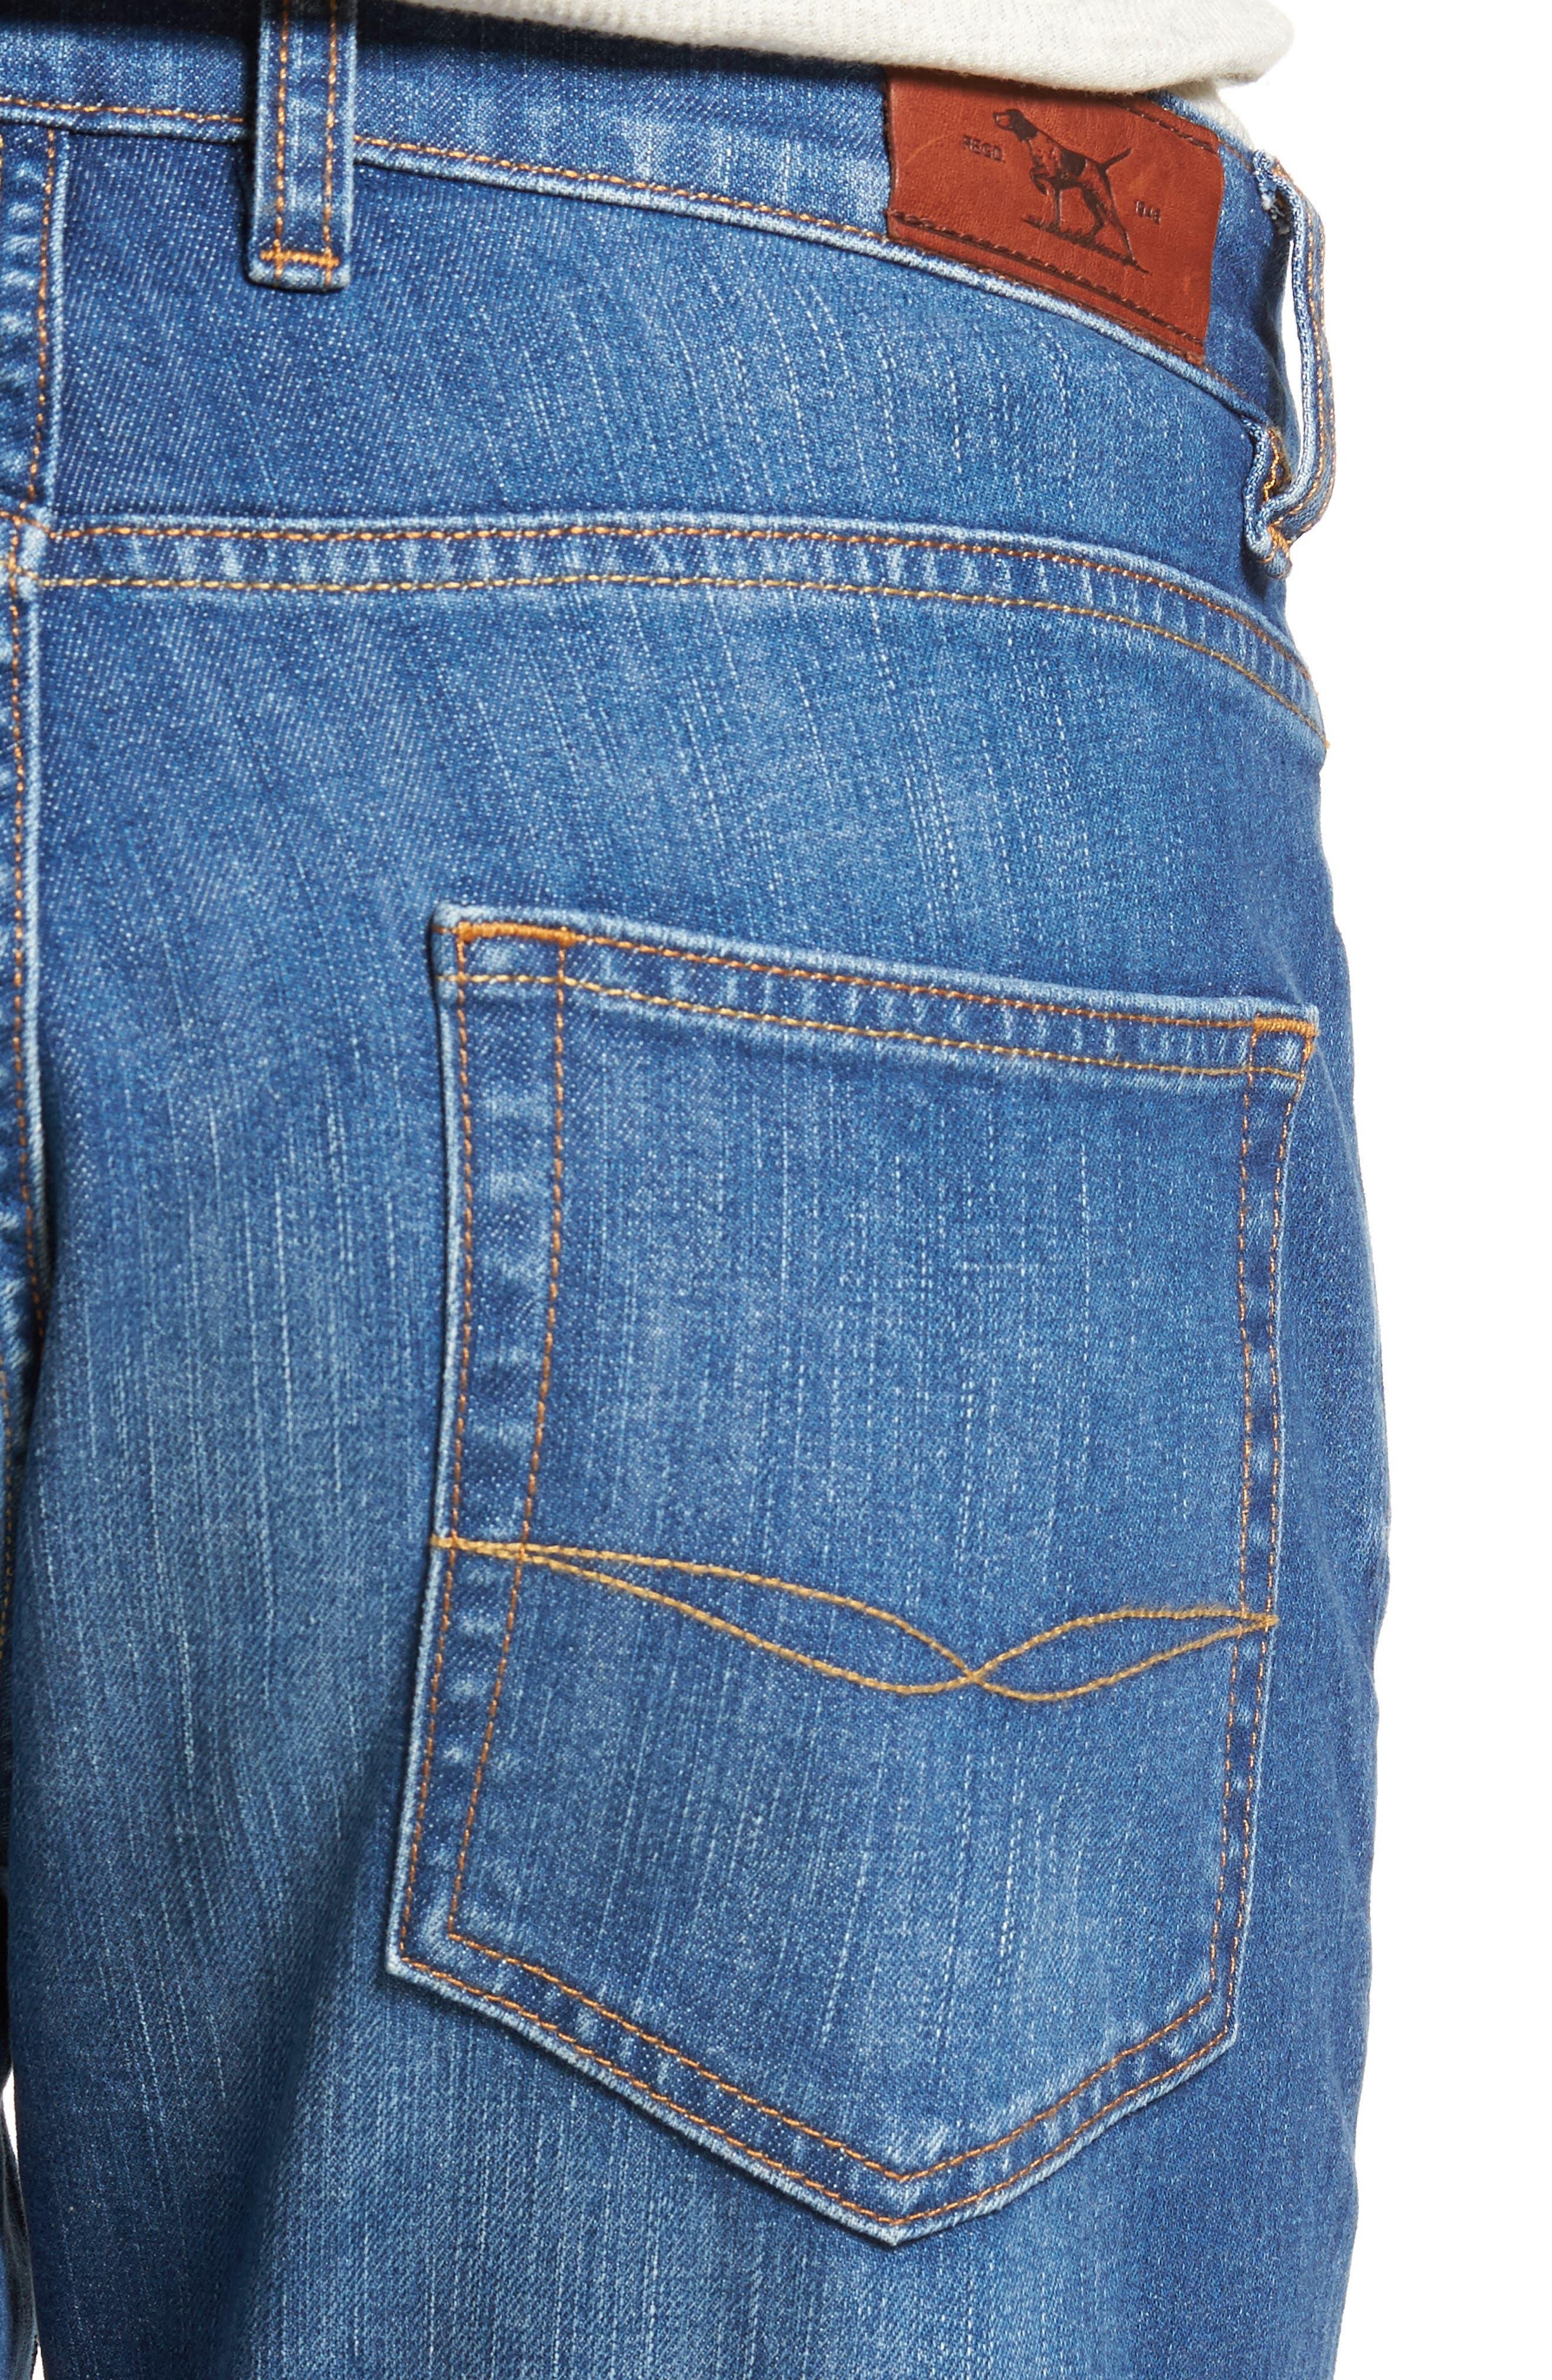 Cranfield Straight Leg Jeans,                             Alternate thumbnail 4, color,                             Denim